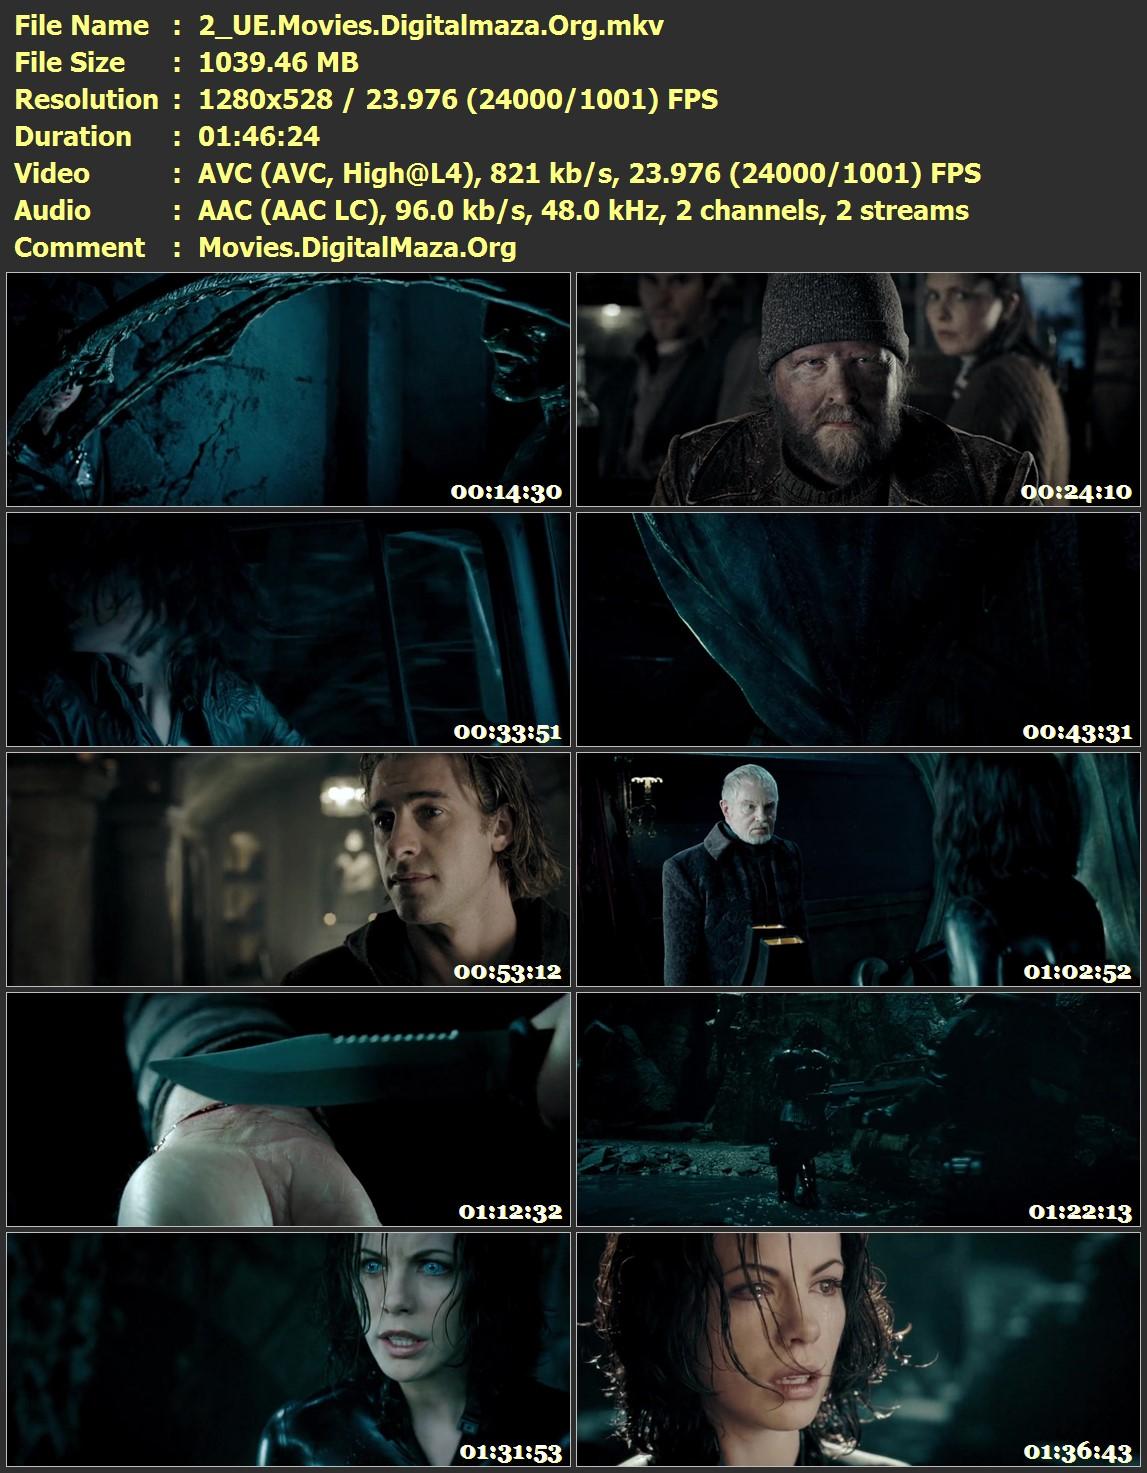 https://image.ibb.co/gf4Knc/2_UE_Movies_Digitalmaza_Org_mkv.jpg